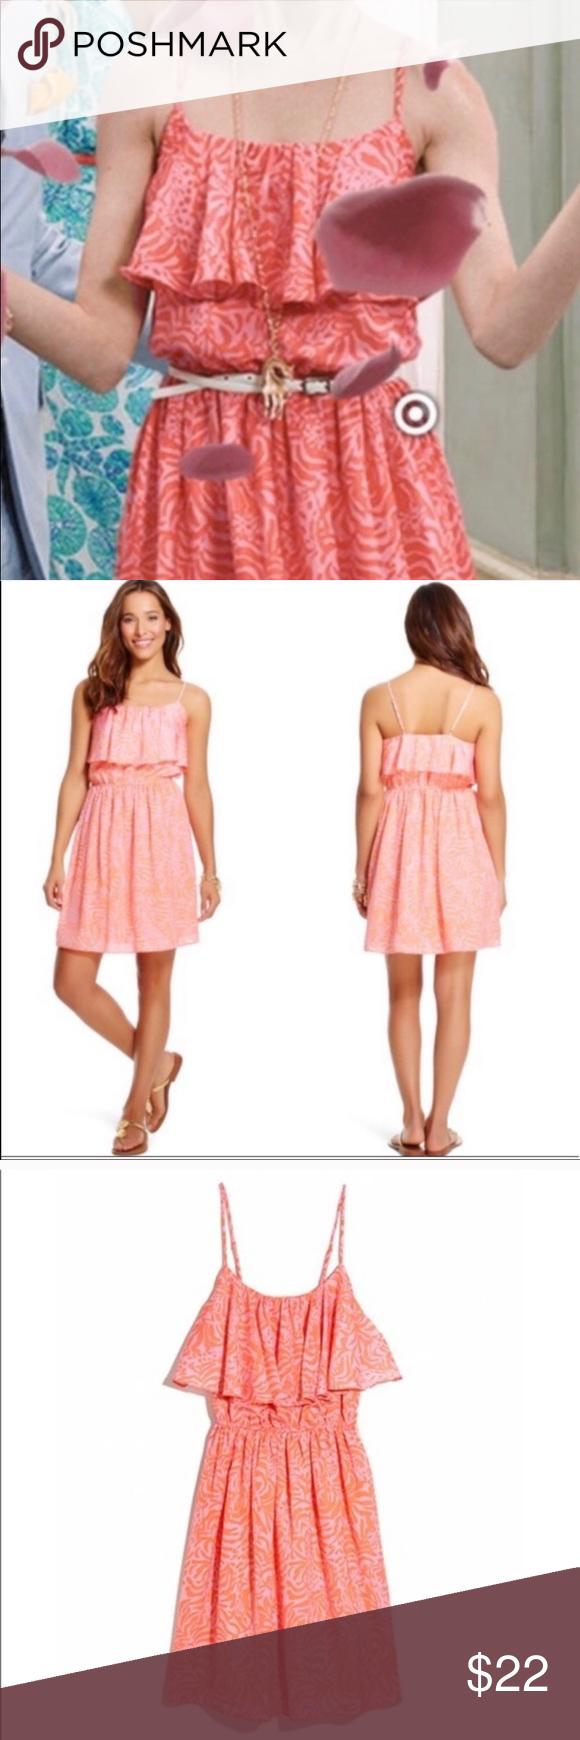 I Just Added This Listing On Poshmark Lilly Pulitzer For Target S Giraffe Flounce Dress Shopmycloset Poshmark Fashio Flounced Dress Clothes Design Fashion [ 1740 x 580 Pixel ]